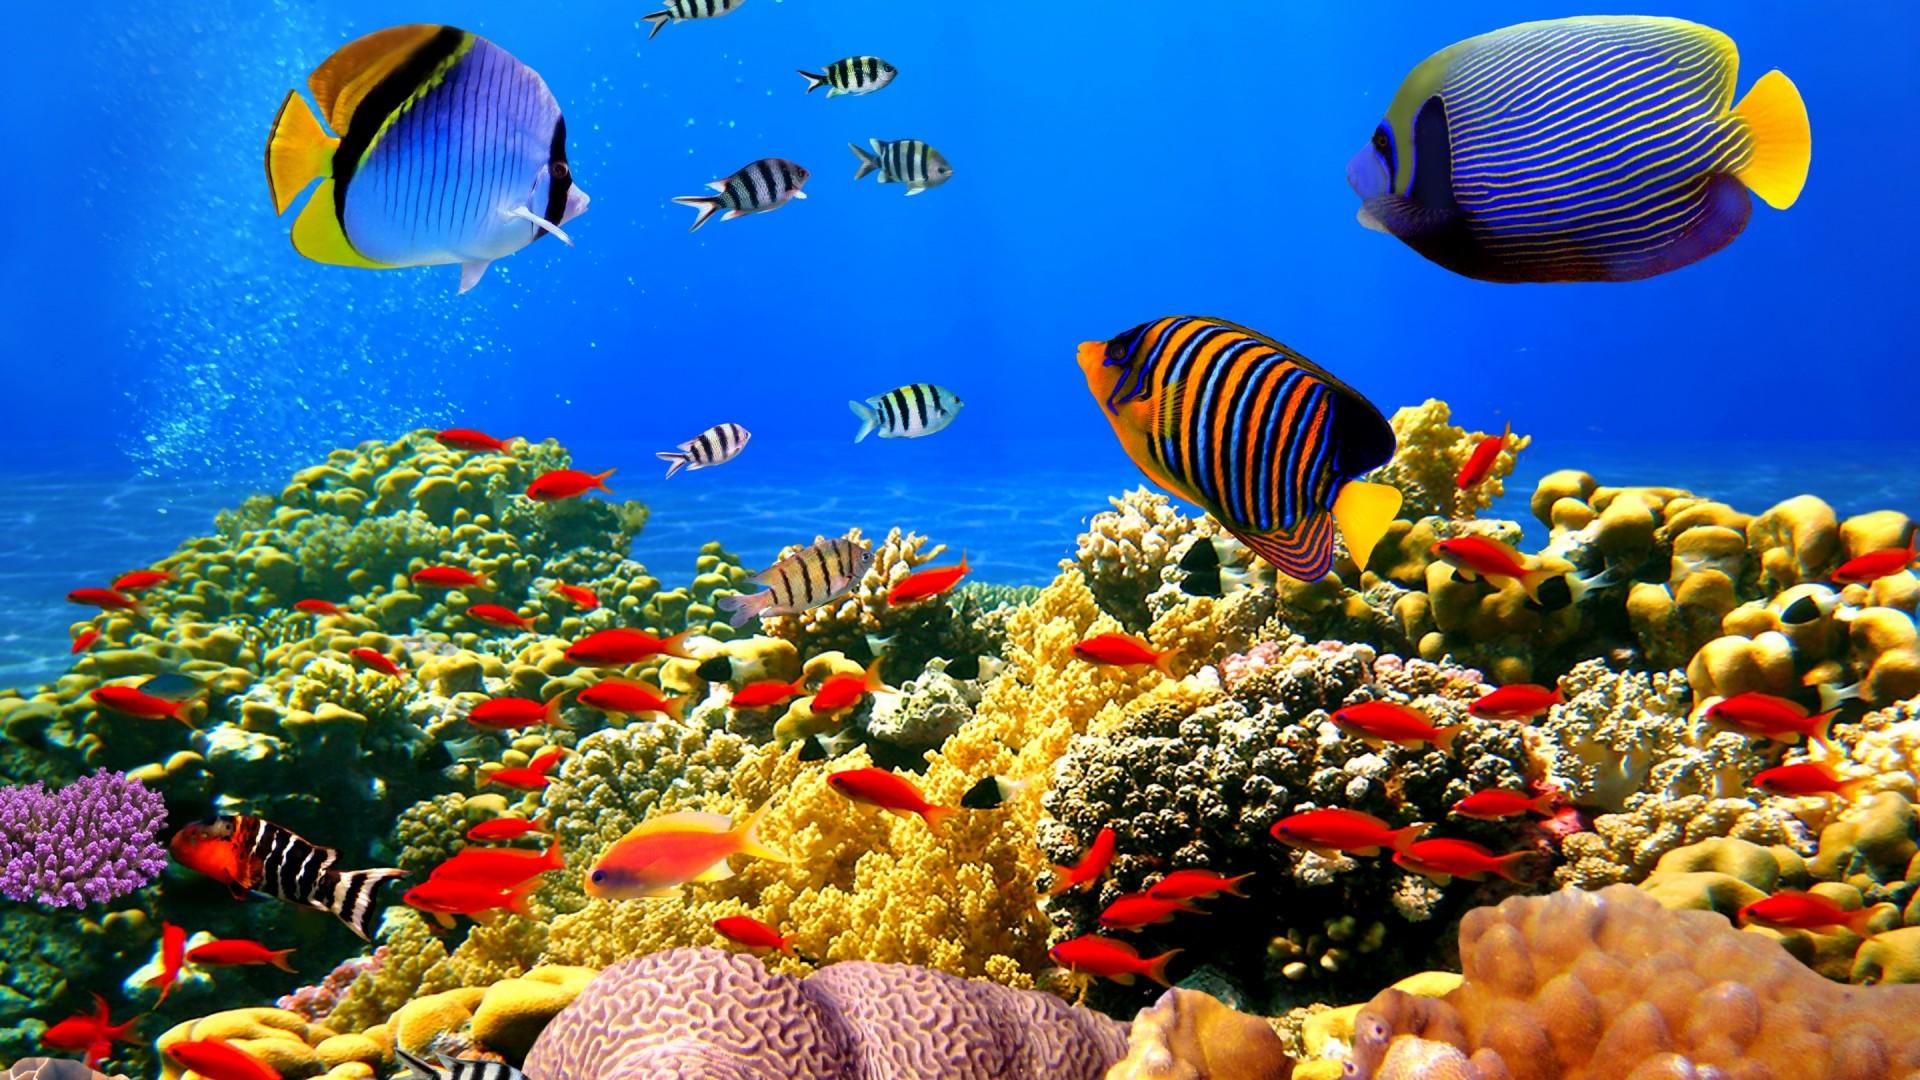 barriera corallina a rischio